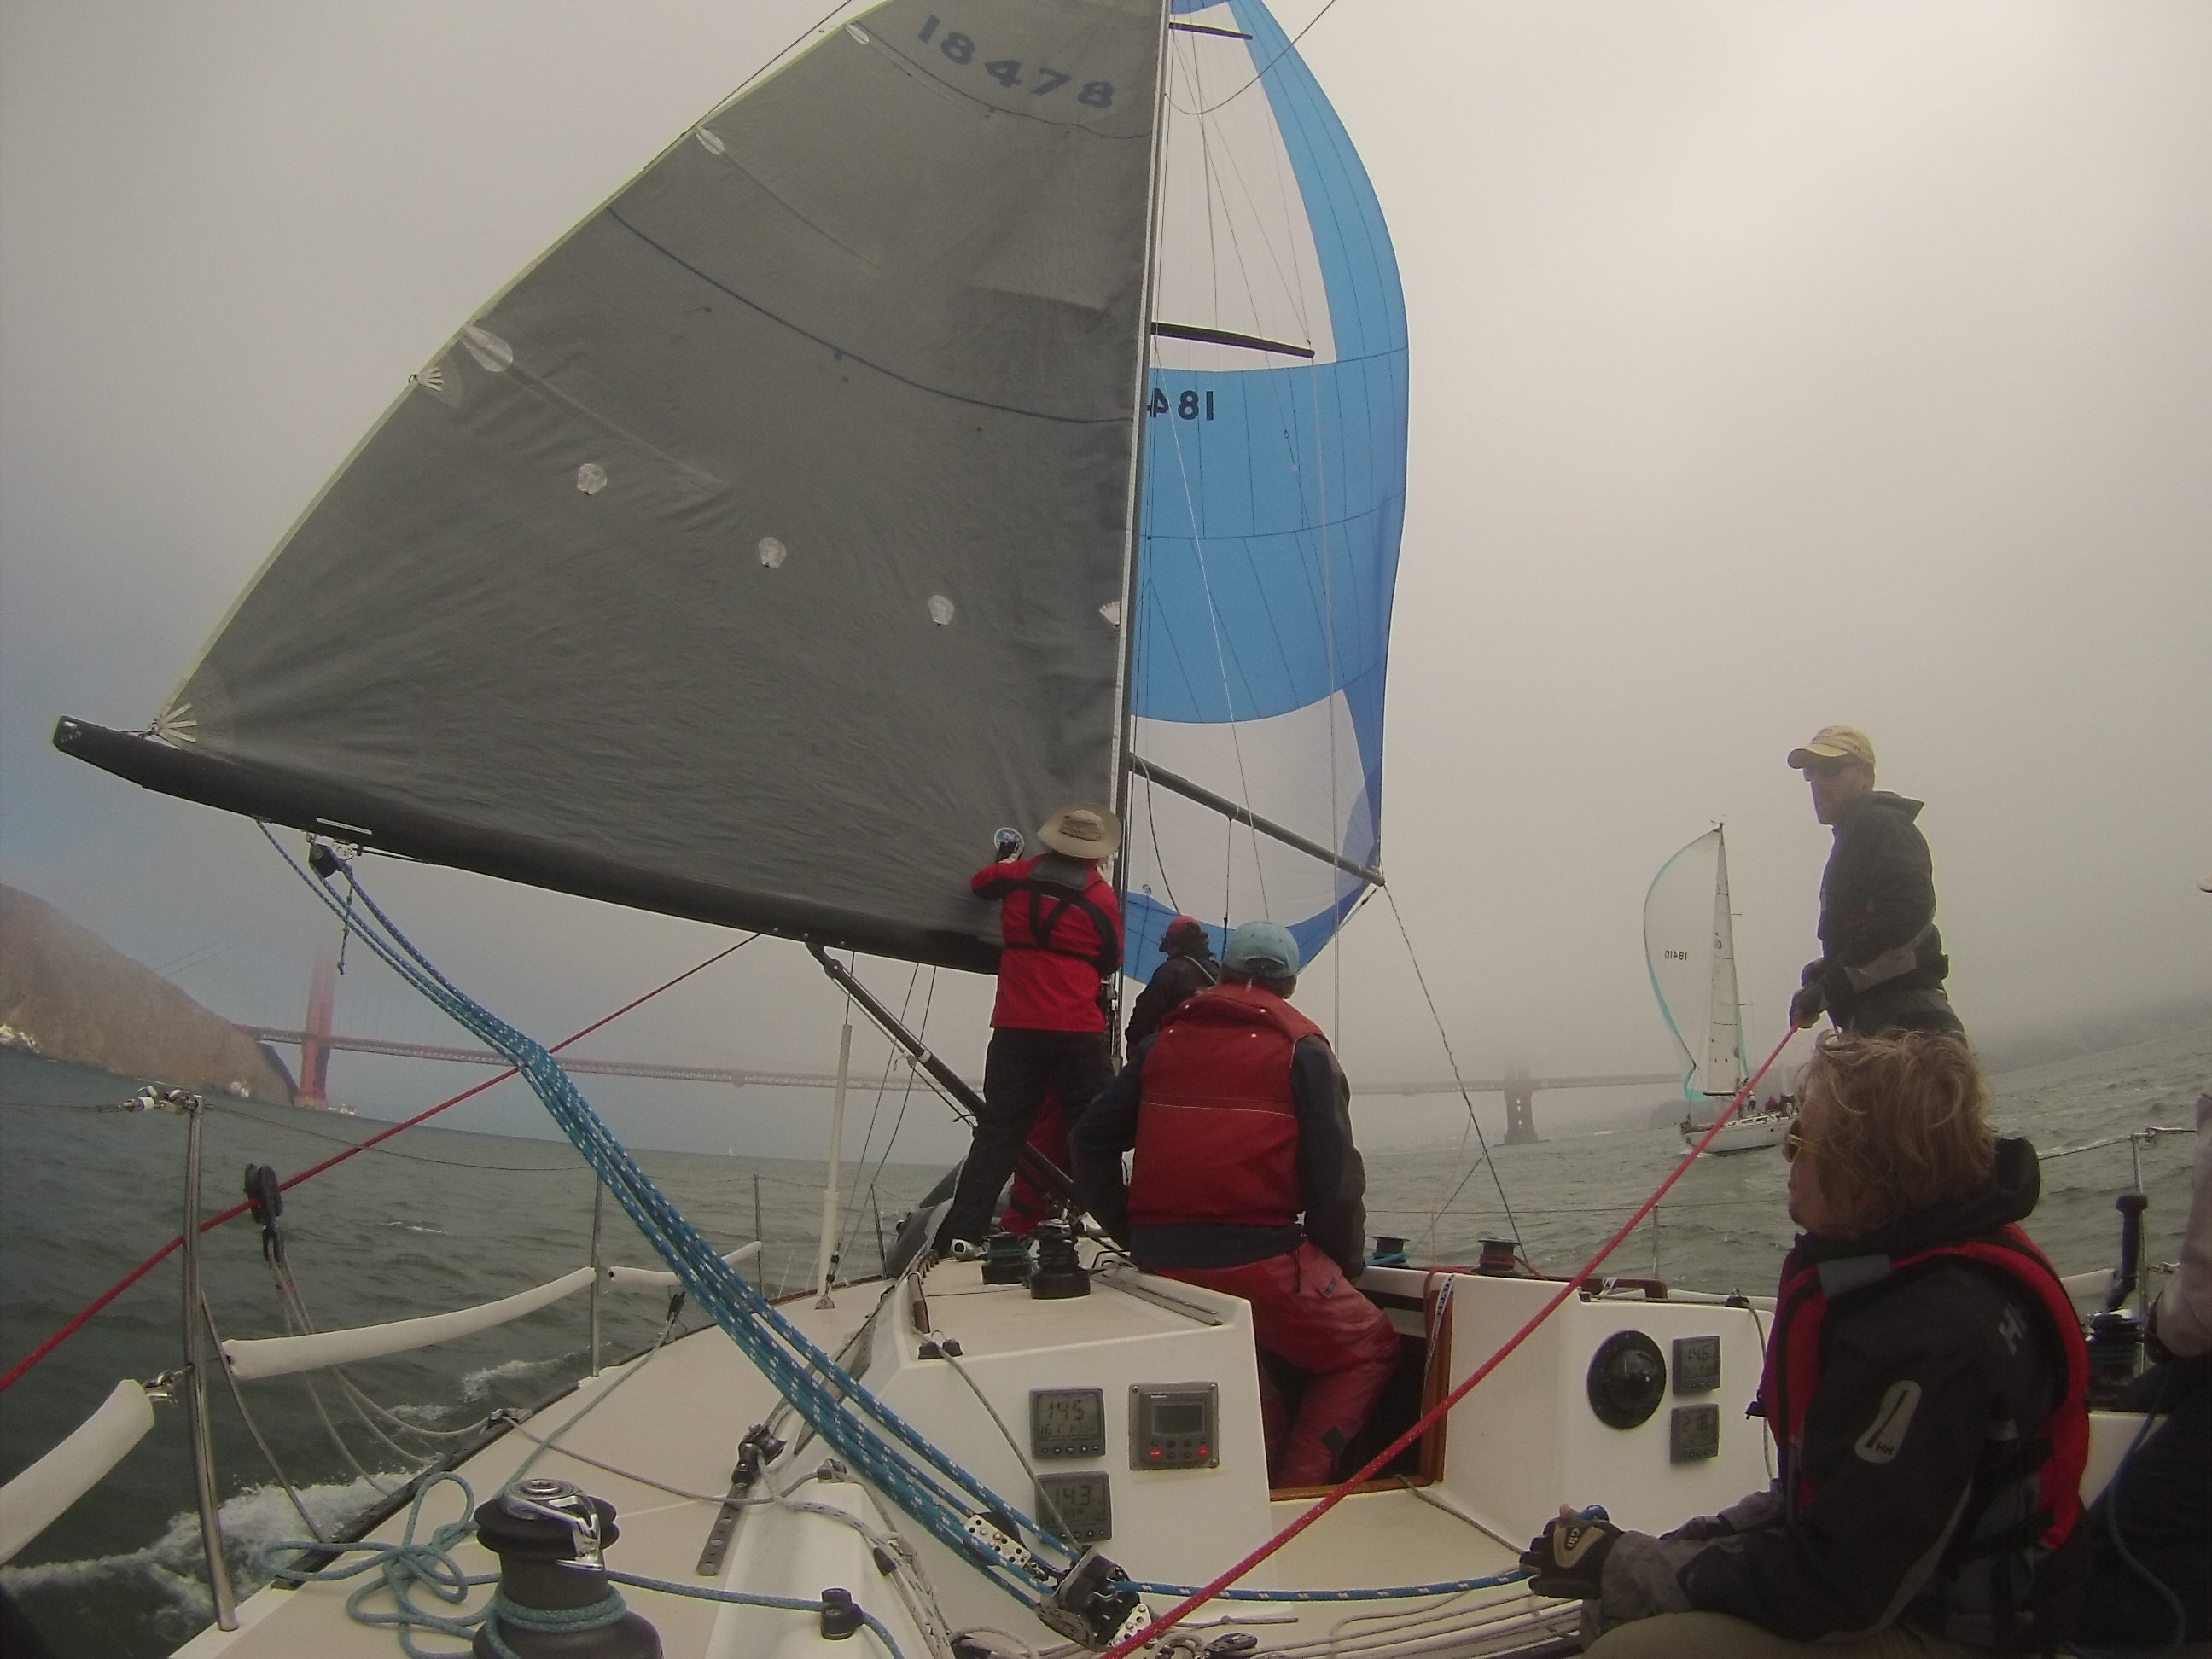 Racing in Big Wind and Fog